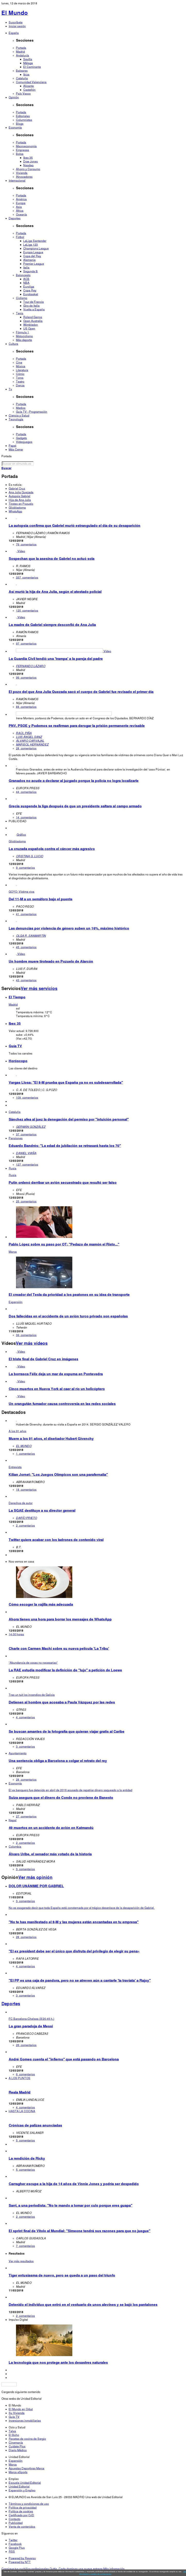 El Mundo at Monday March 12, 2018, 2:13 p.m. UTC